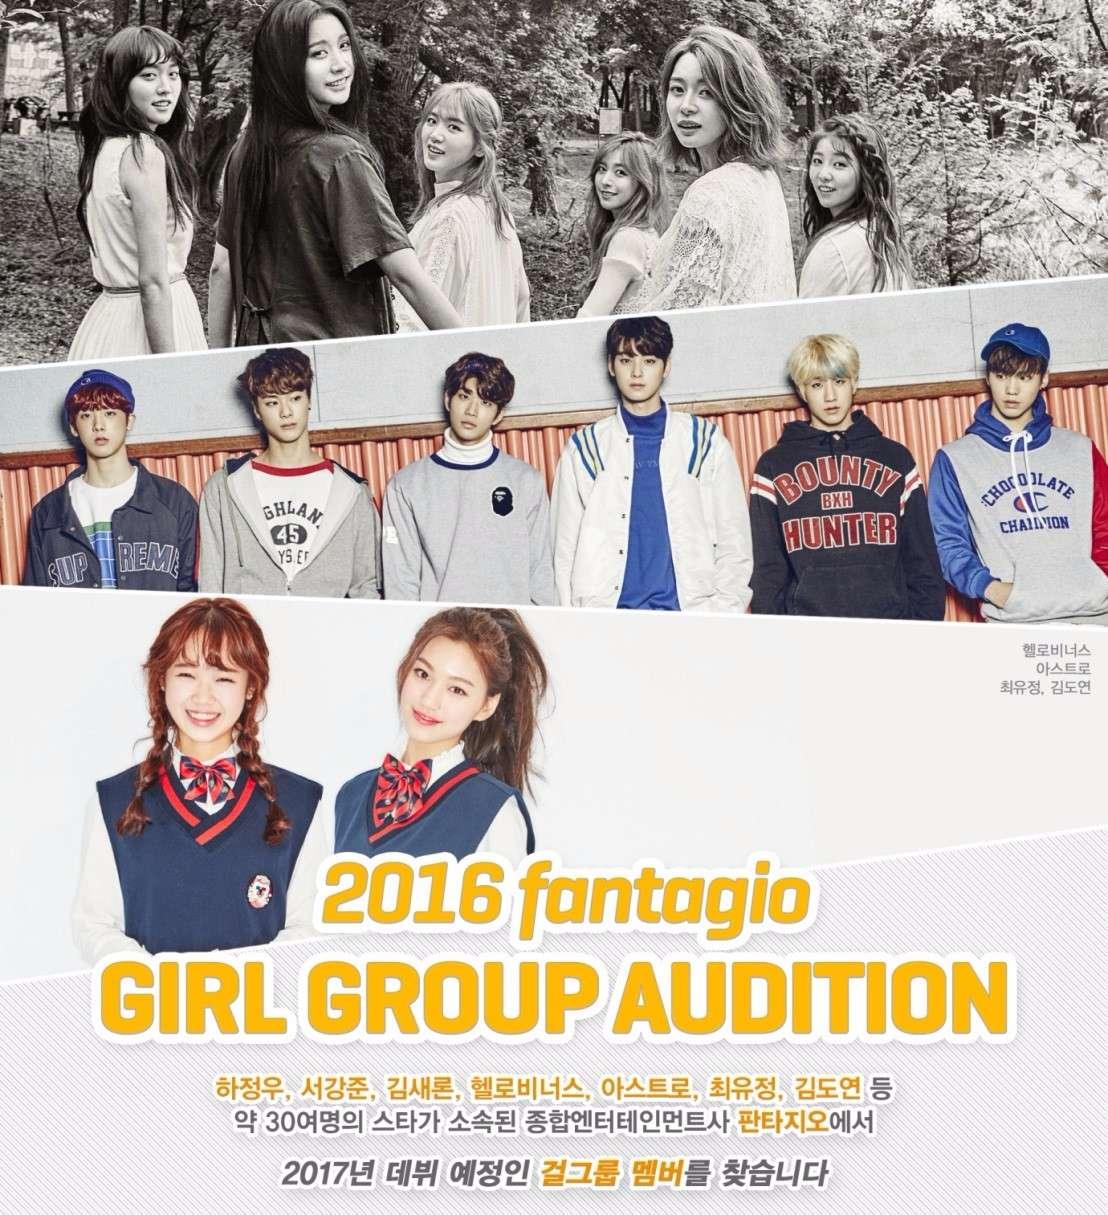 Fantagio旗下還有大家熟知的演員徐康俊、金賽綸,偶像團體Hello Venus、ASTRO等,想成為她們的師妹的不要錯過XD